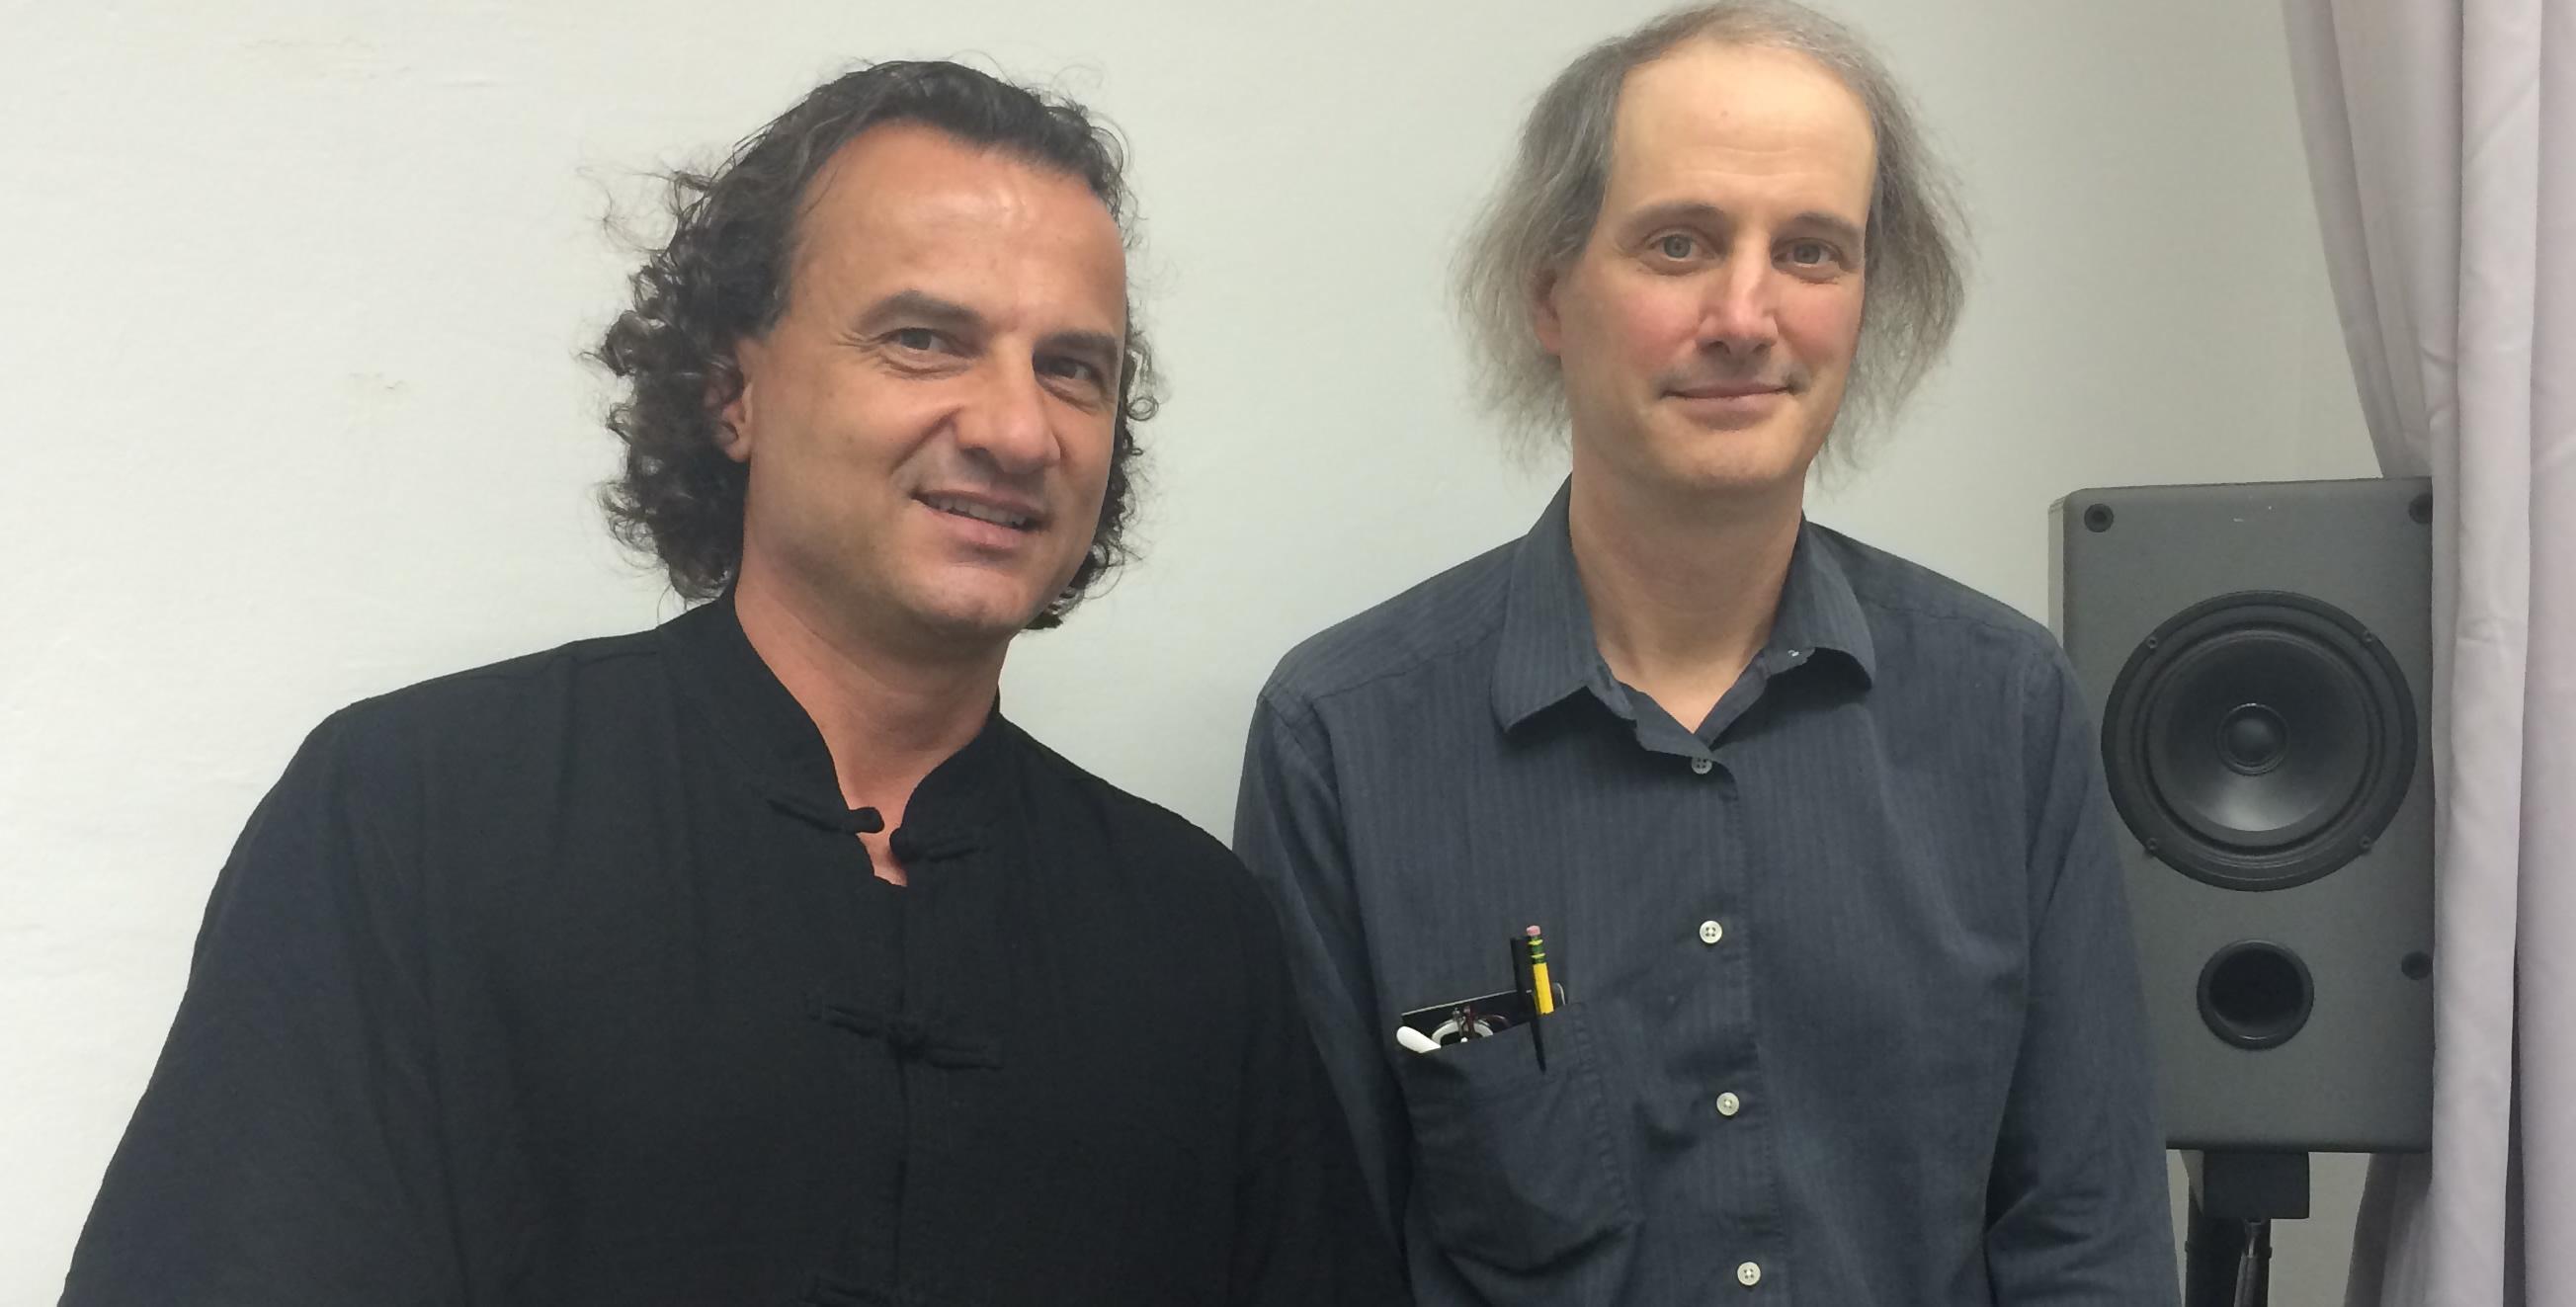 Omid e Miller Puckette